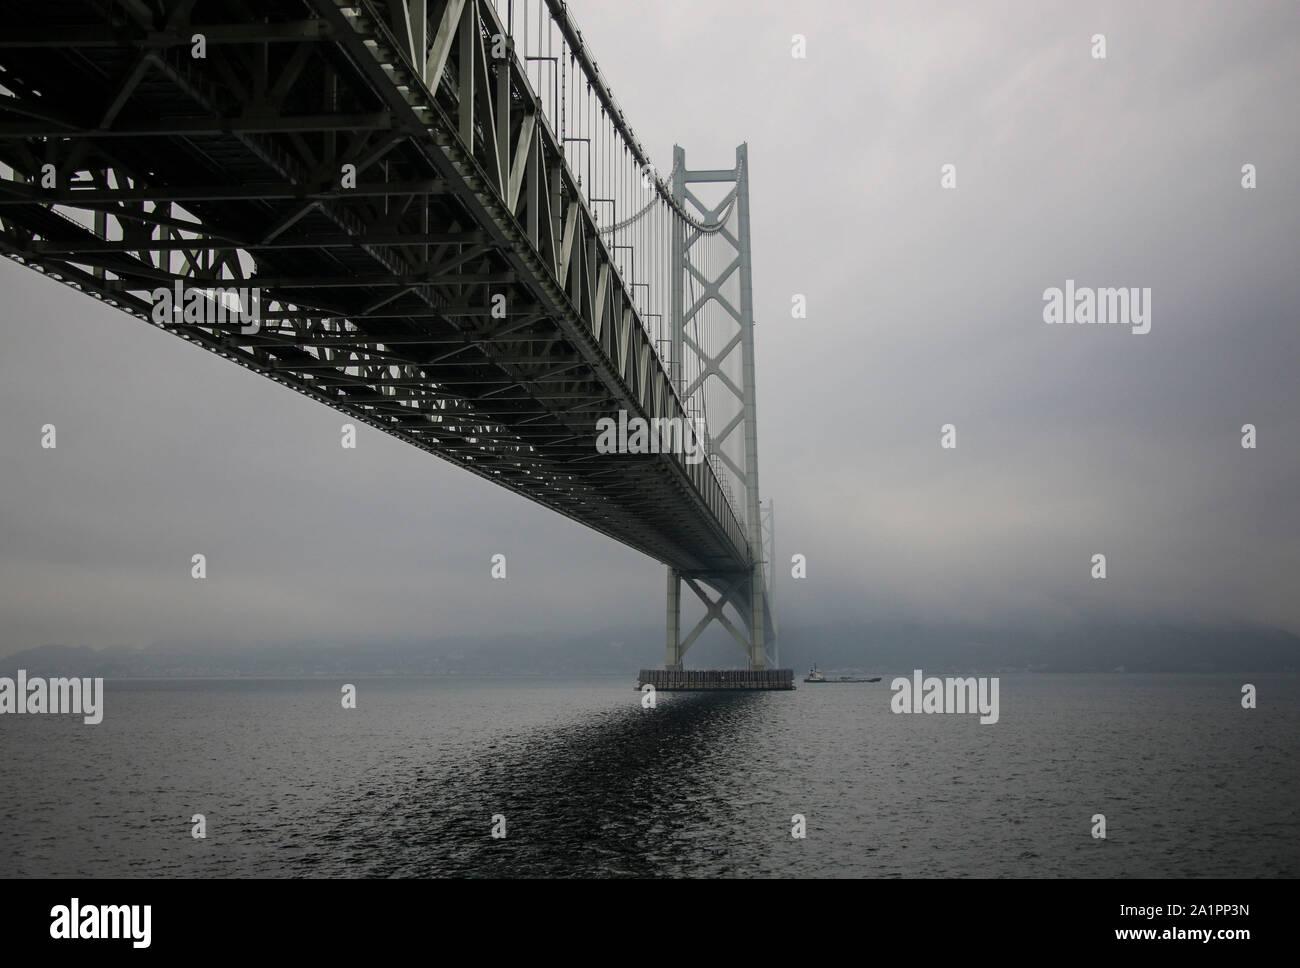 Puente Akashi Kaikyo spanning el Mar Interior de Seto desde Awaji Island a Kobe, Japón. Foto de stock